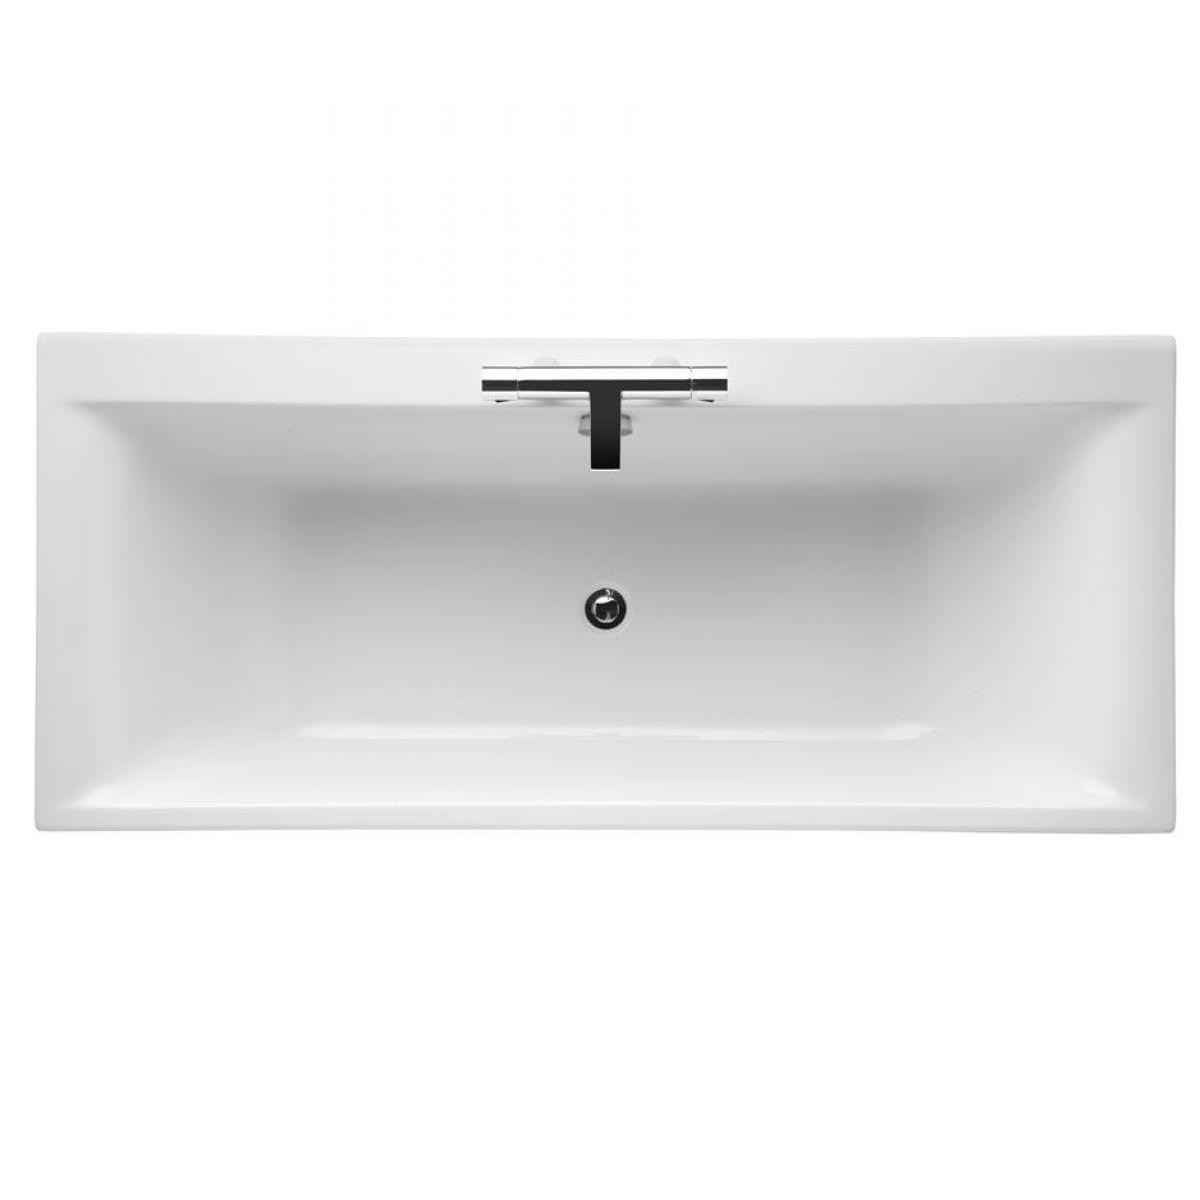 Ideal Standard Concept Idealform Double Ended Bath : UK Bathrooms